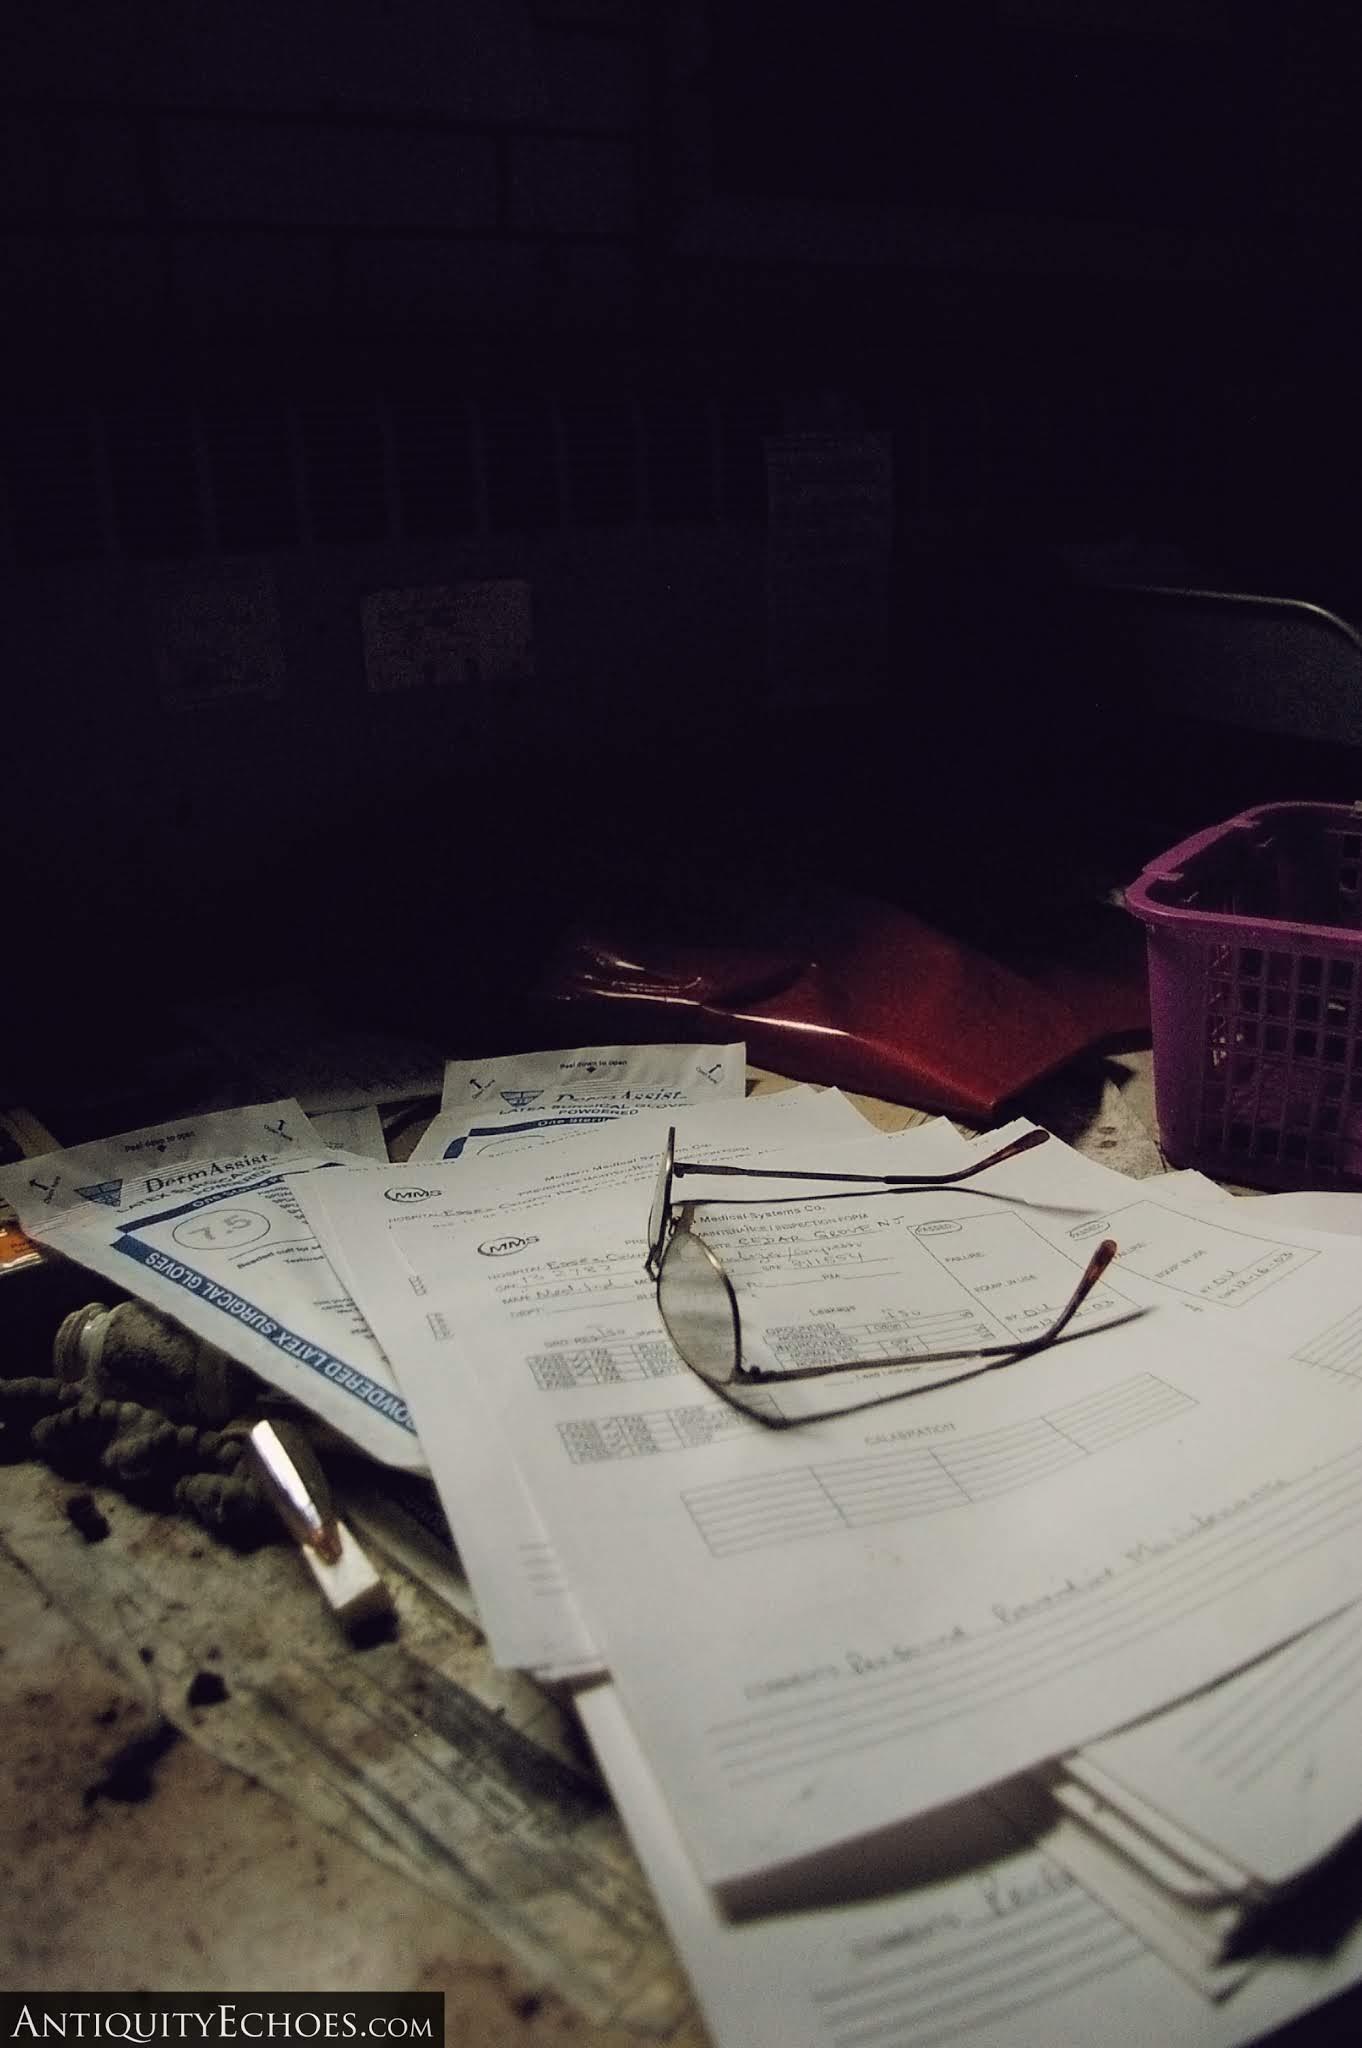 Overbrook Asylum - Reading Glasses Left Behind on Paperwork